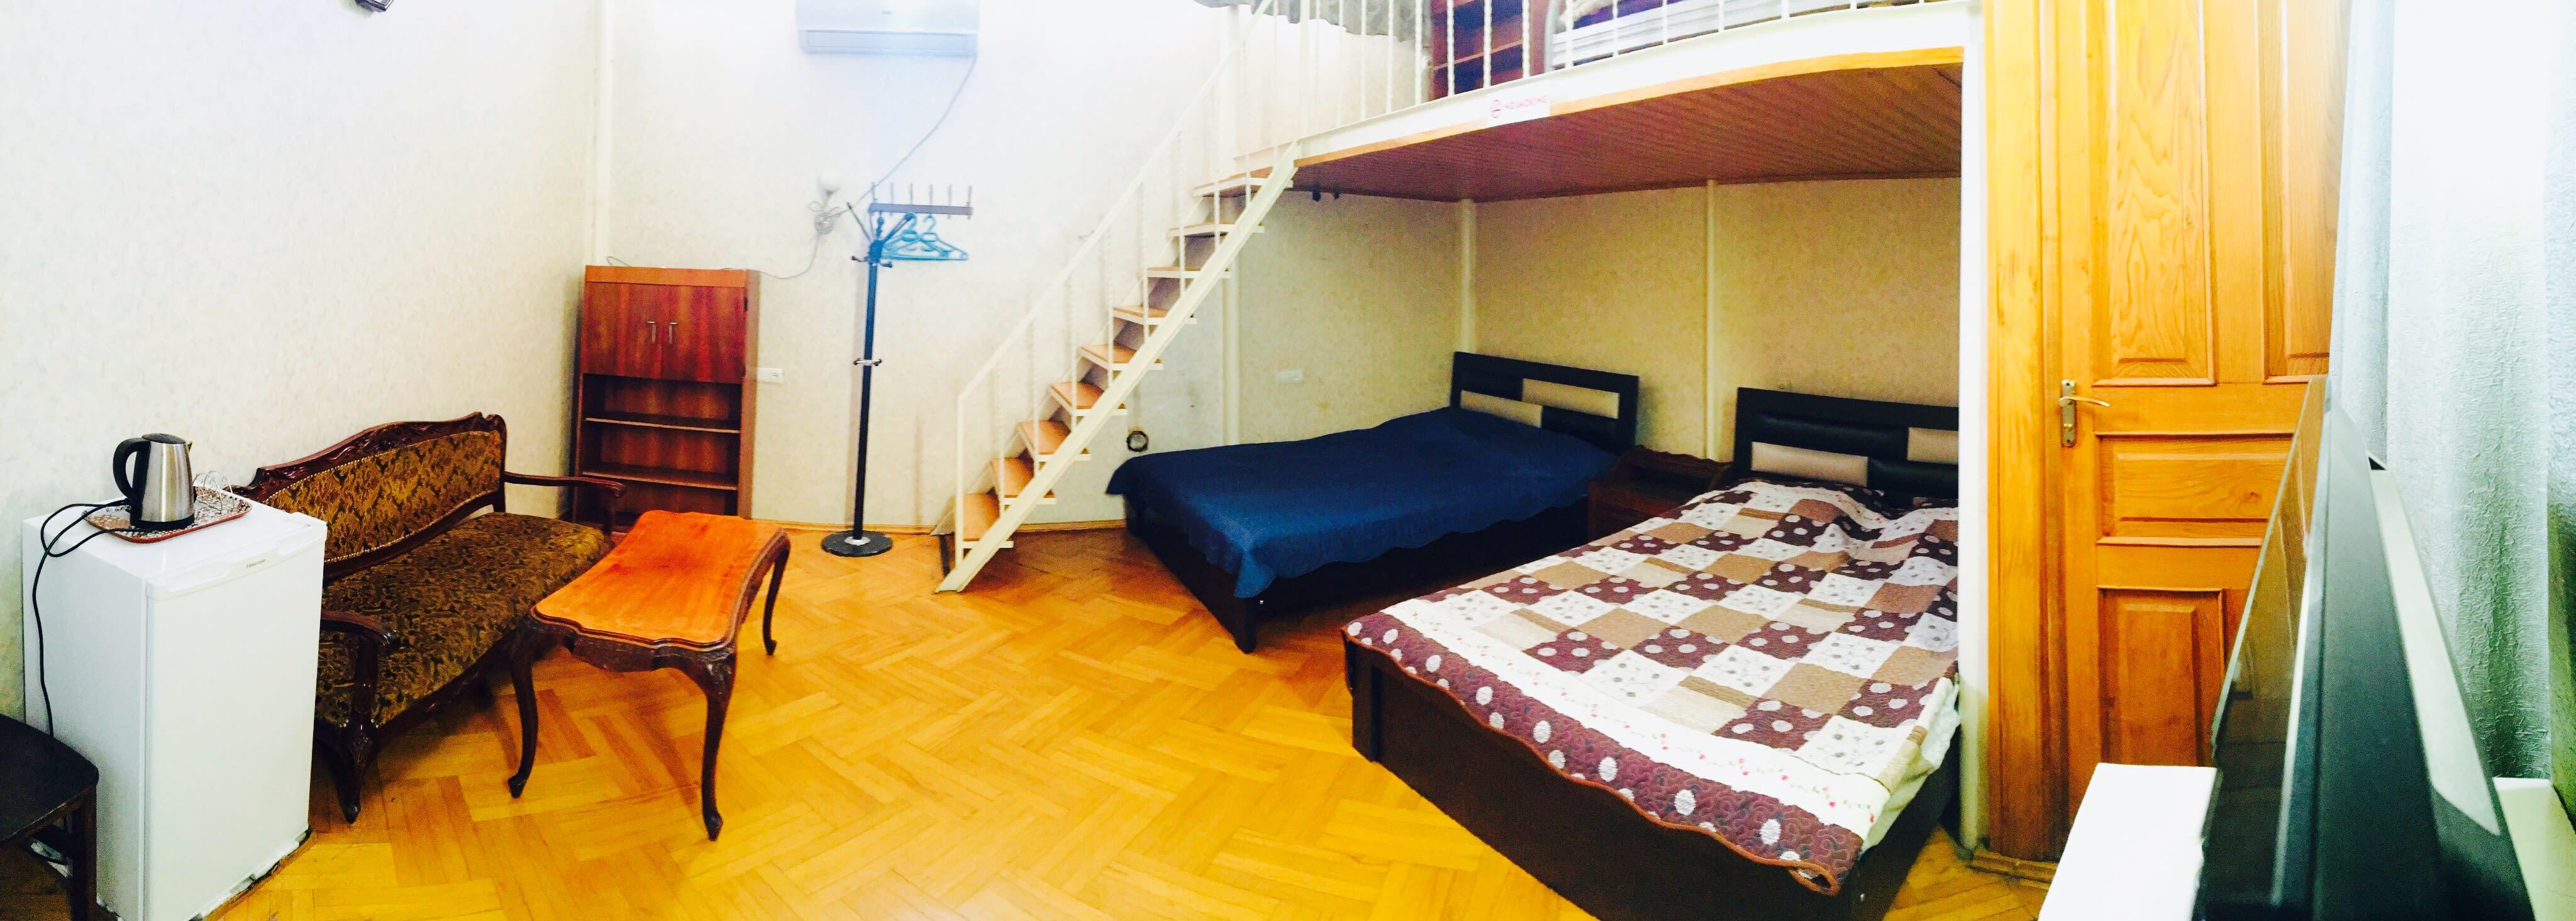 HOSTEL - Parallax Hostel